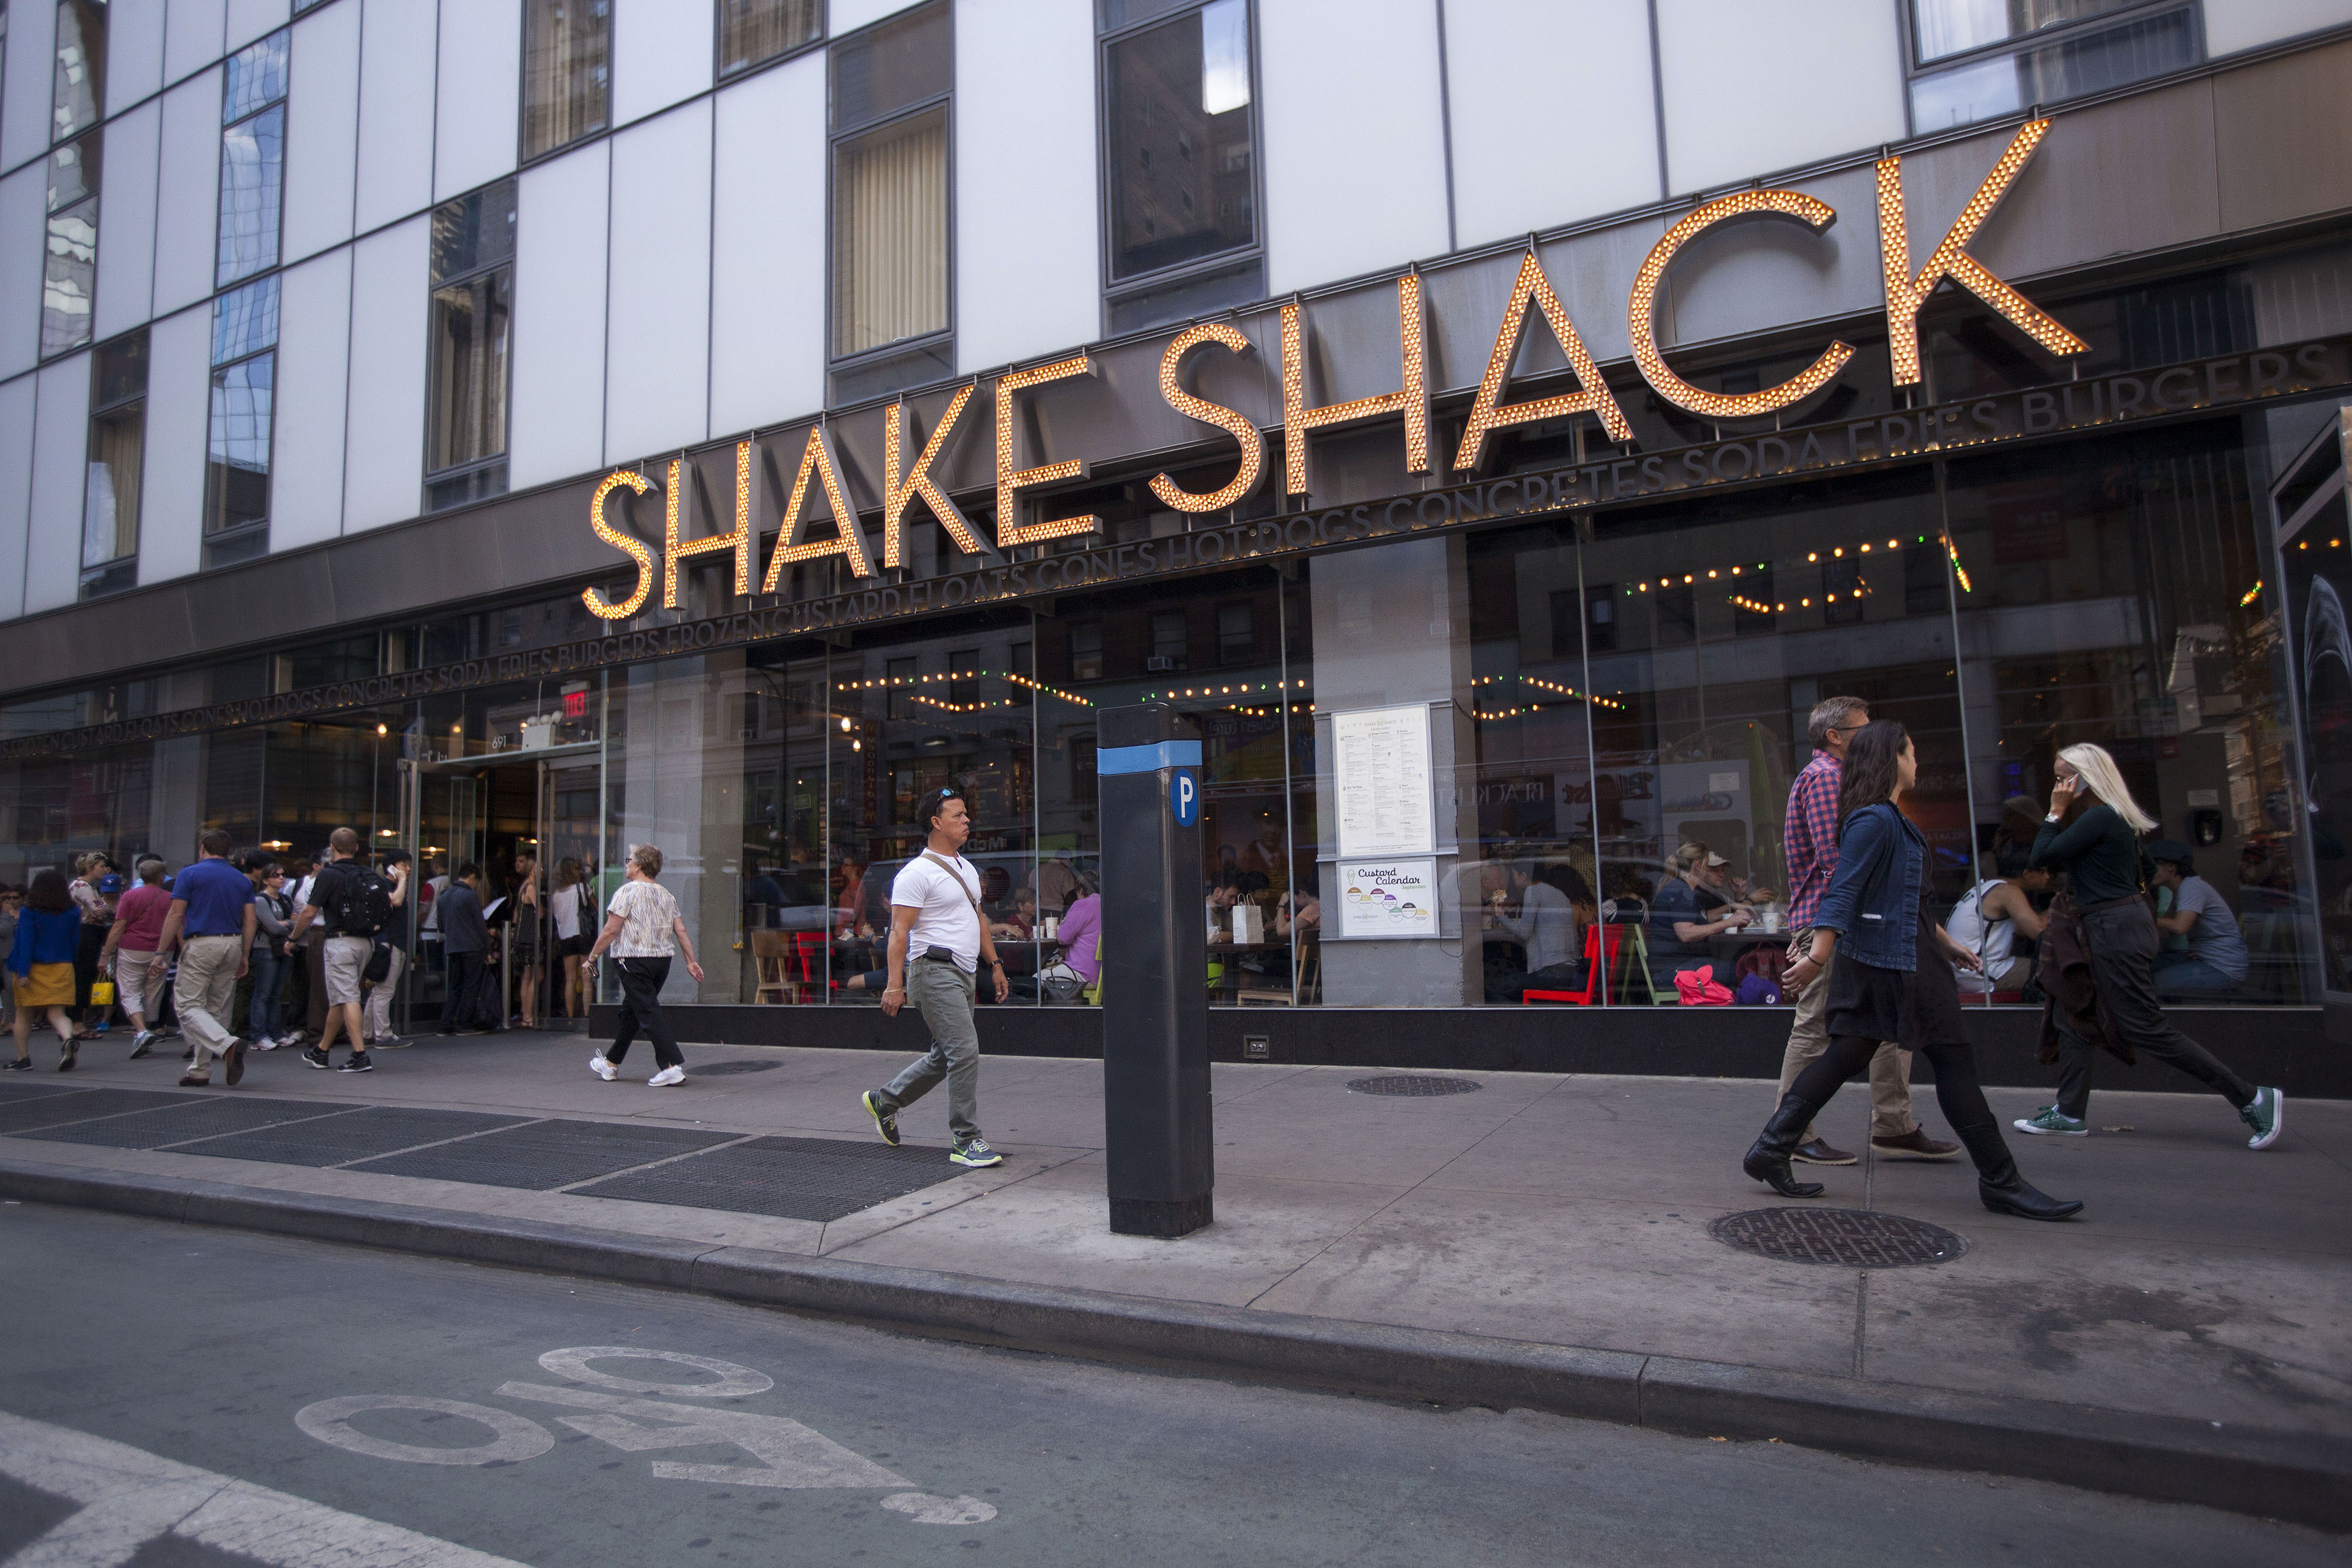 A Shake Shack restaurant in New York City.